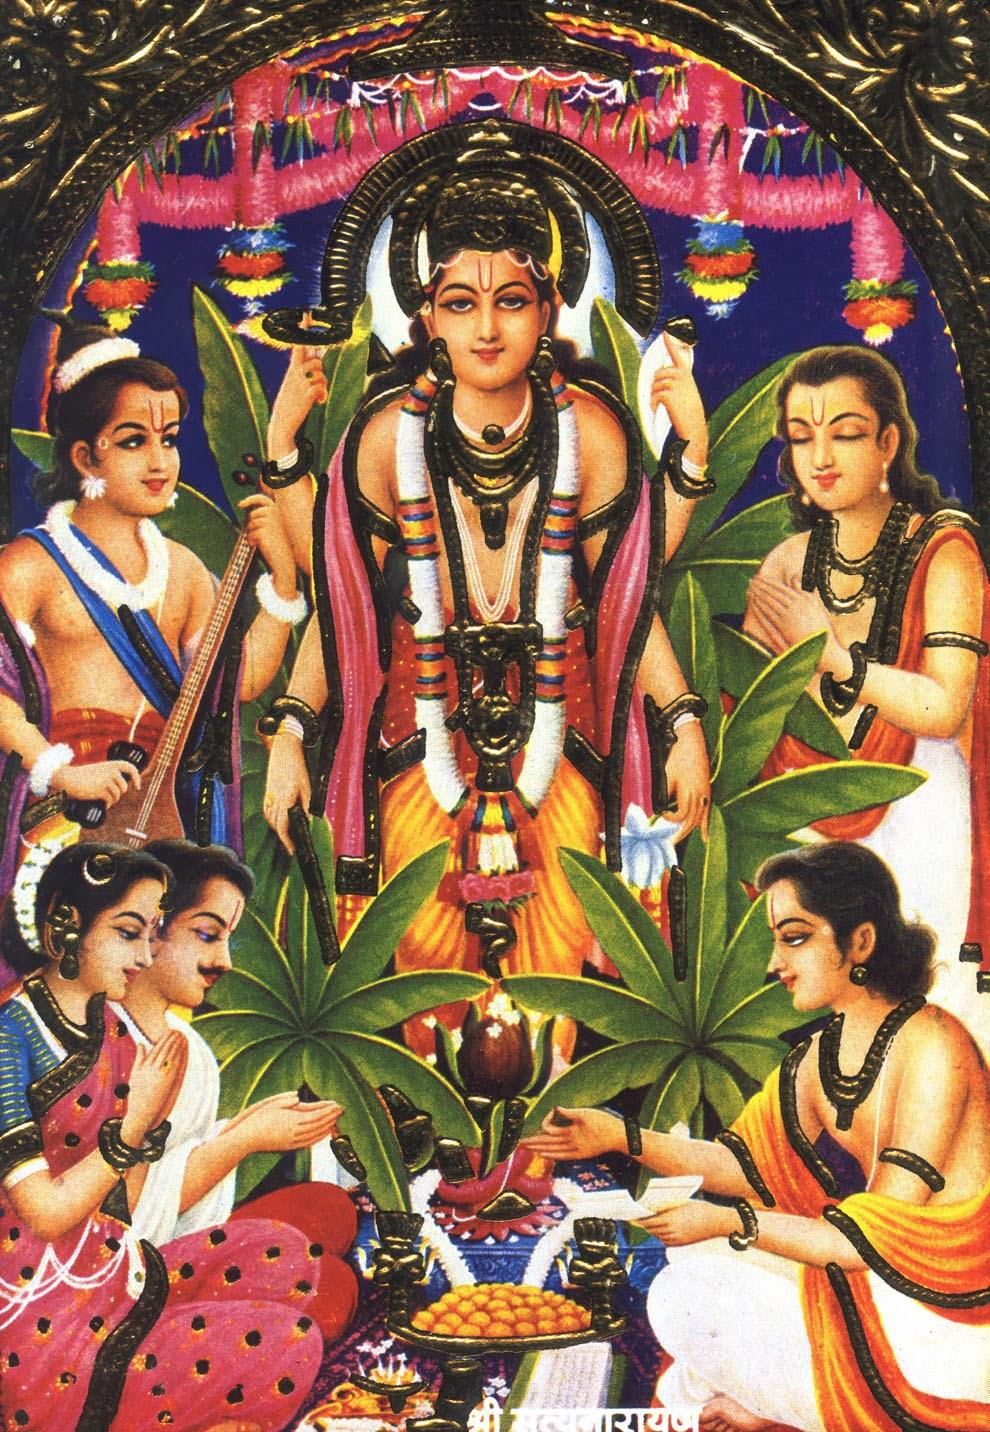 Beautiful Wallpapers Lord Satyanarayan Hd Wallpapers For Desktop And Mobile-7020